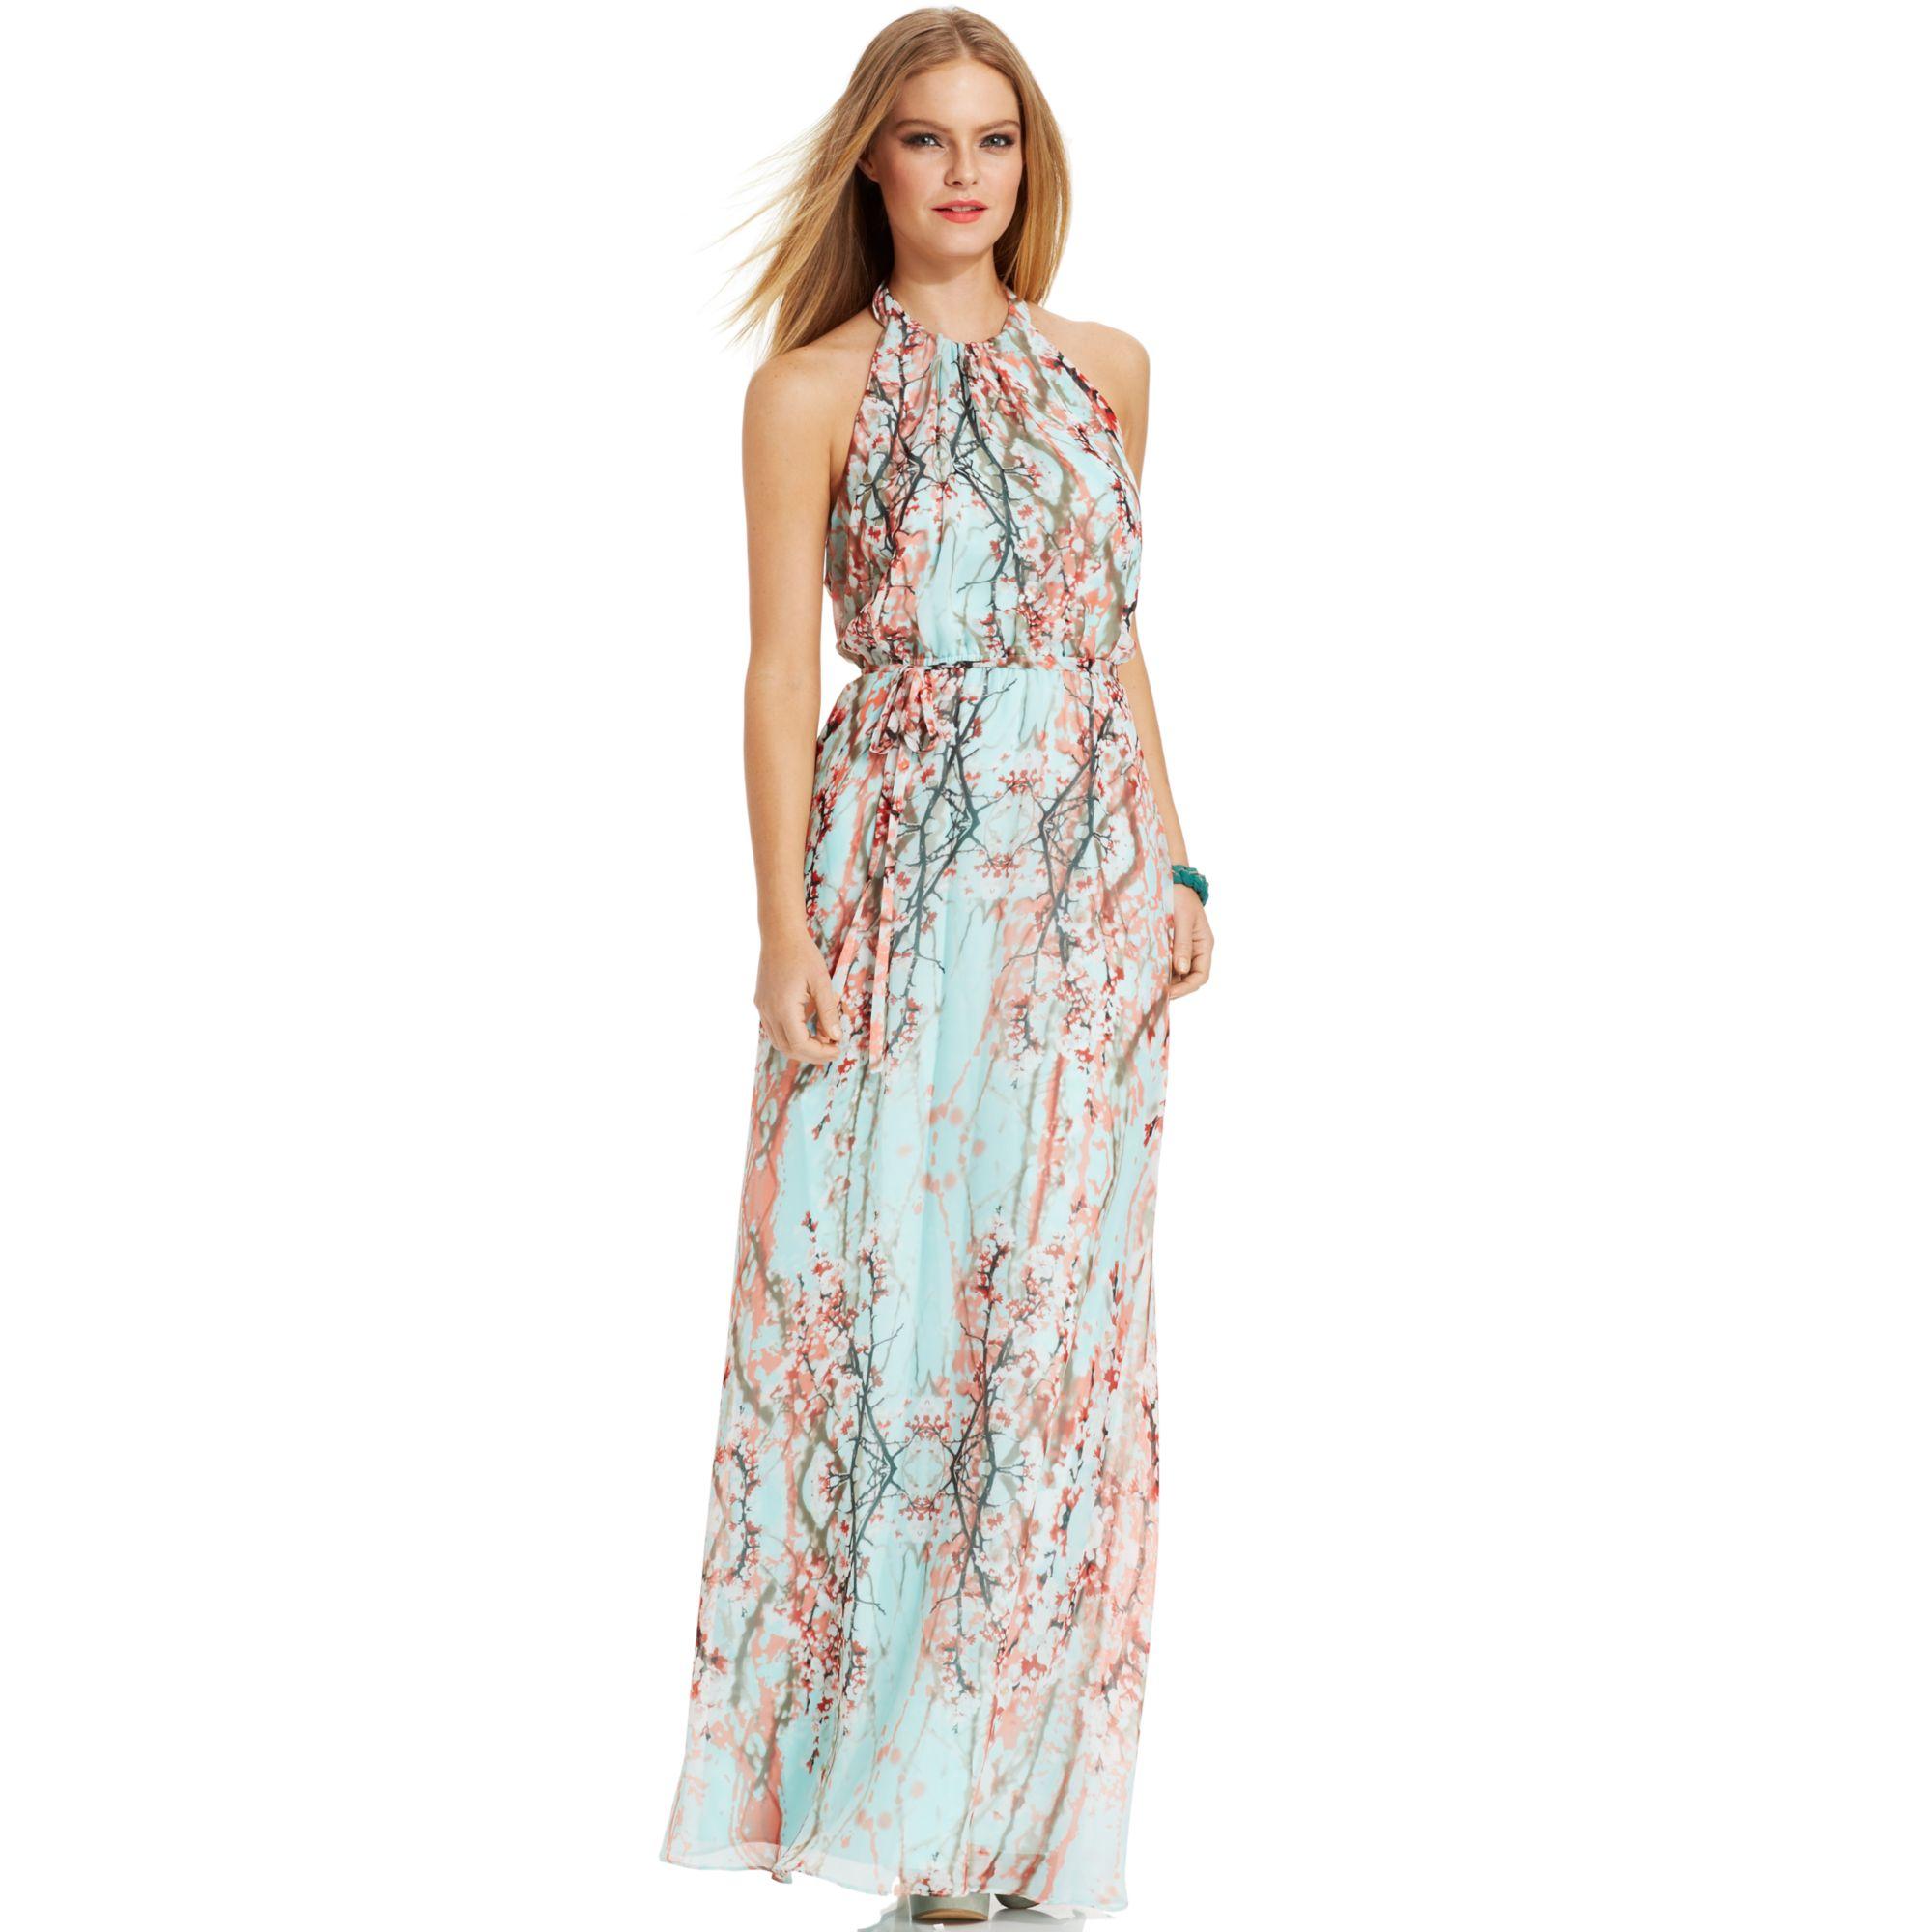 Jessica simpson Floralprint Halter Maxi Dress | Lyst